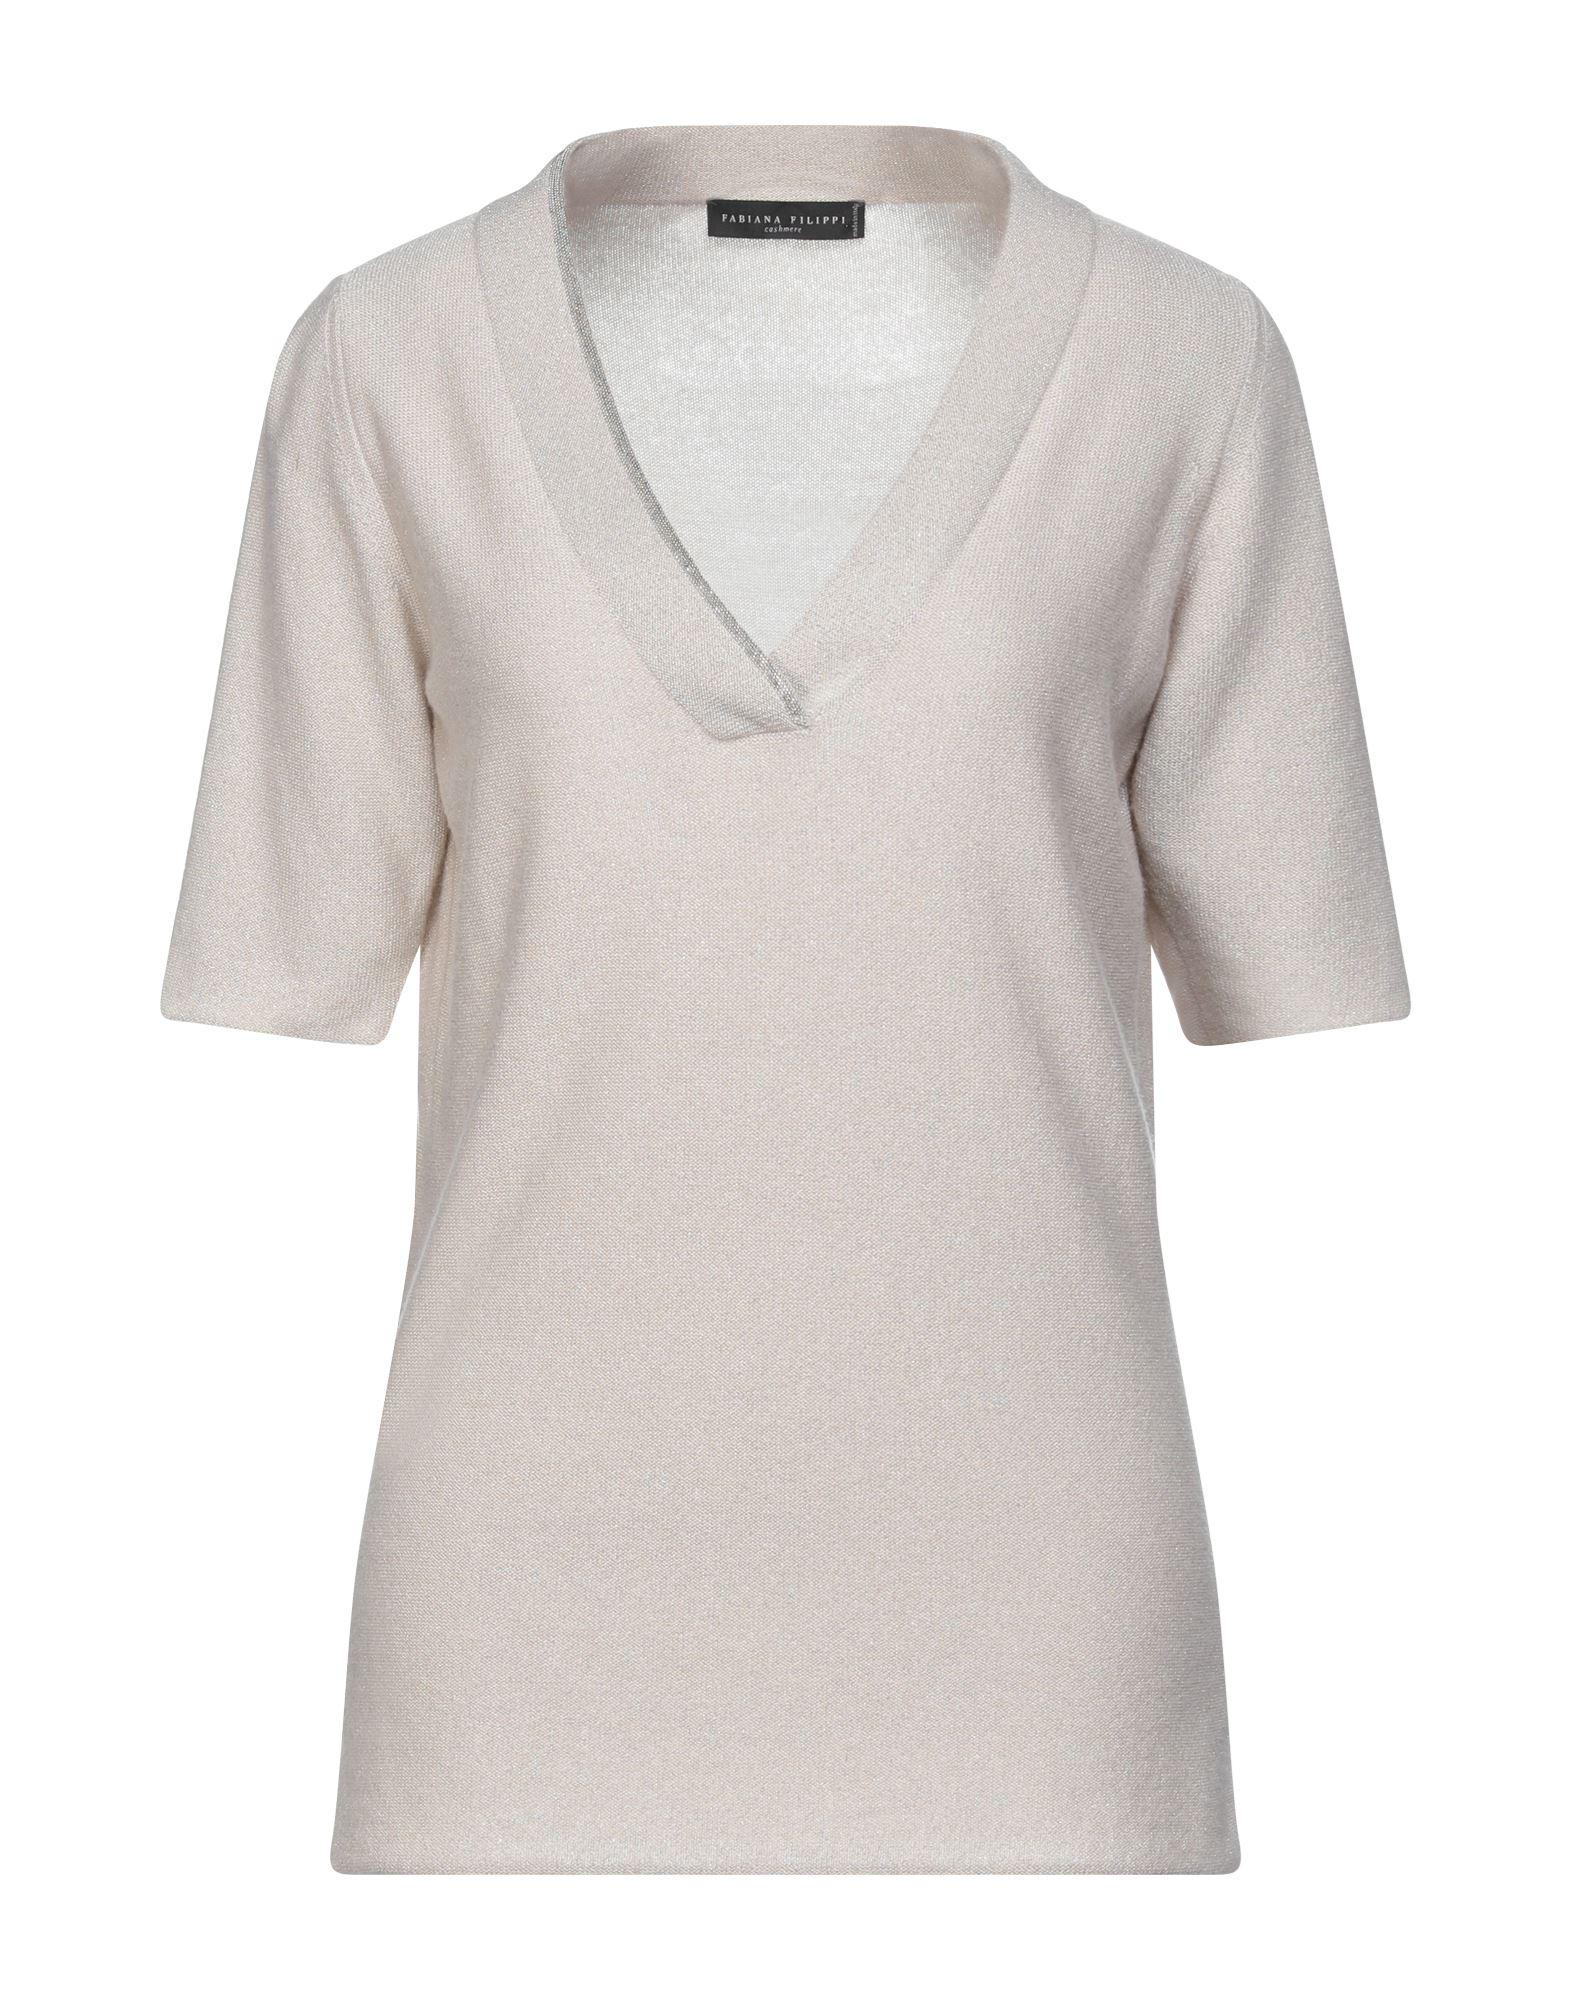 FABIANA FILIPPI Sweaters - Item 14121694